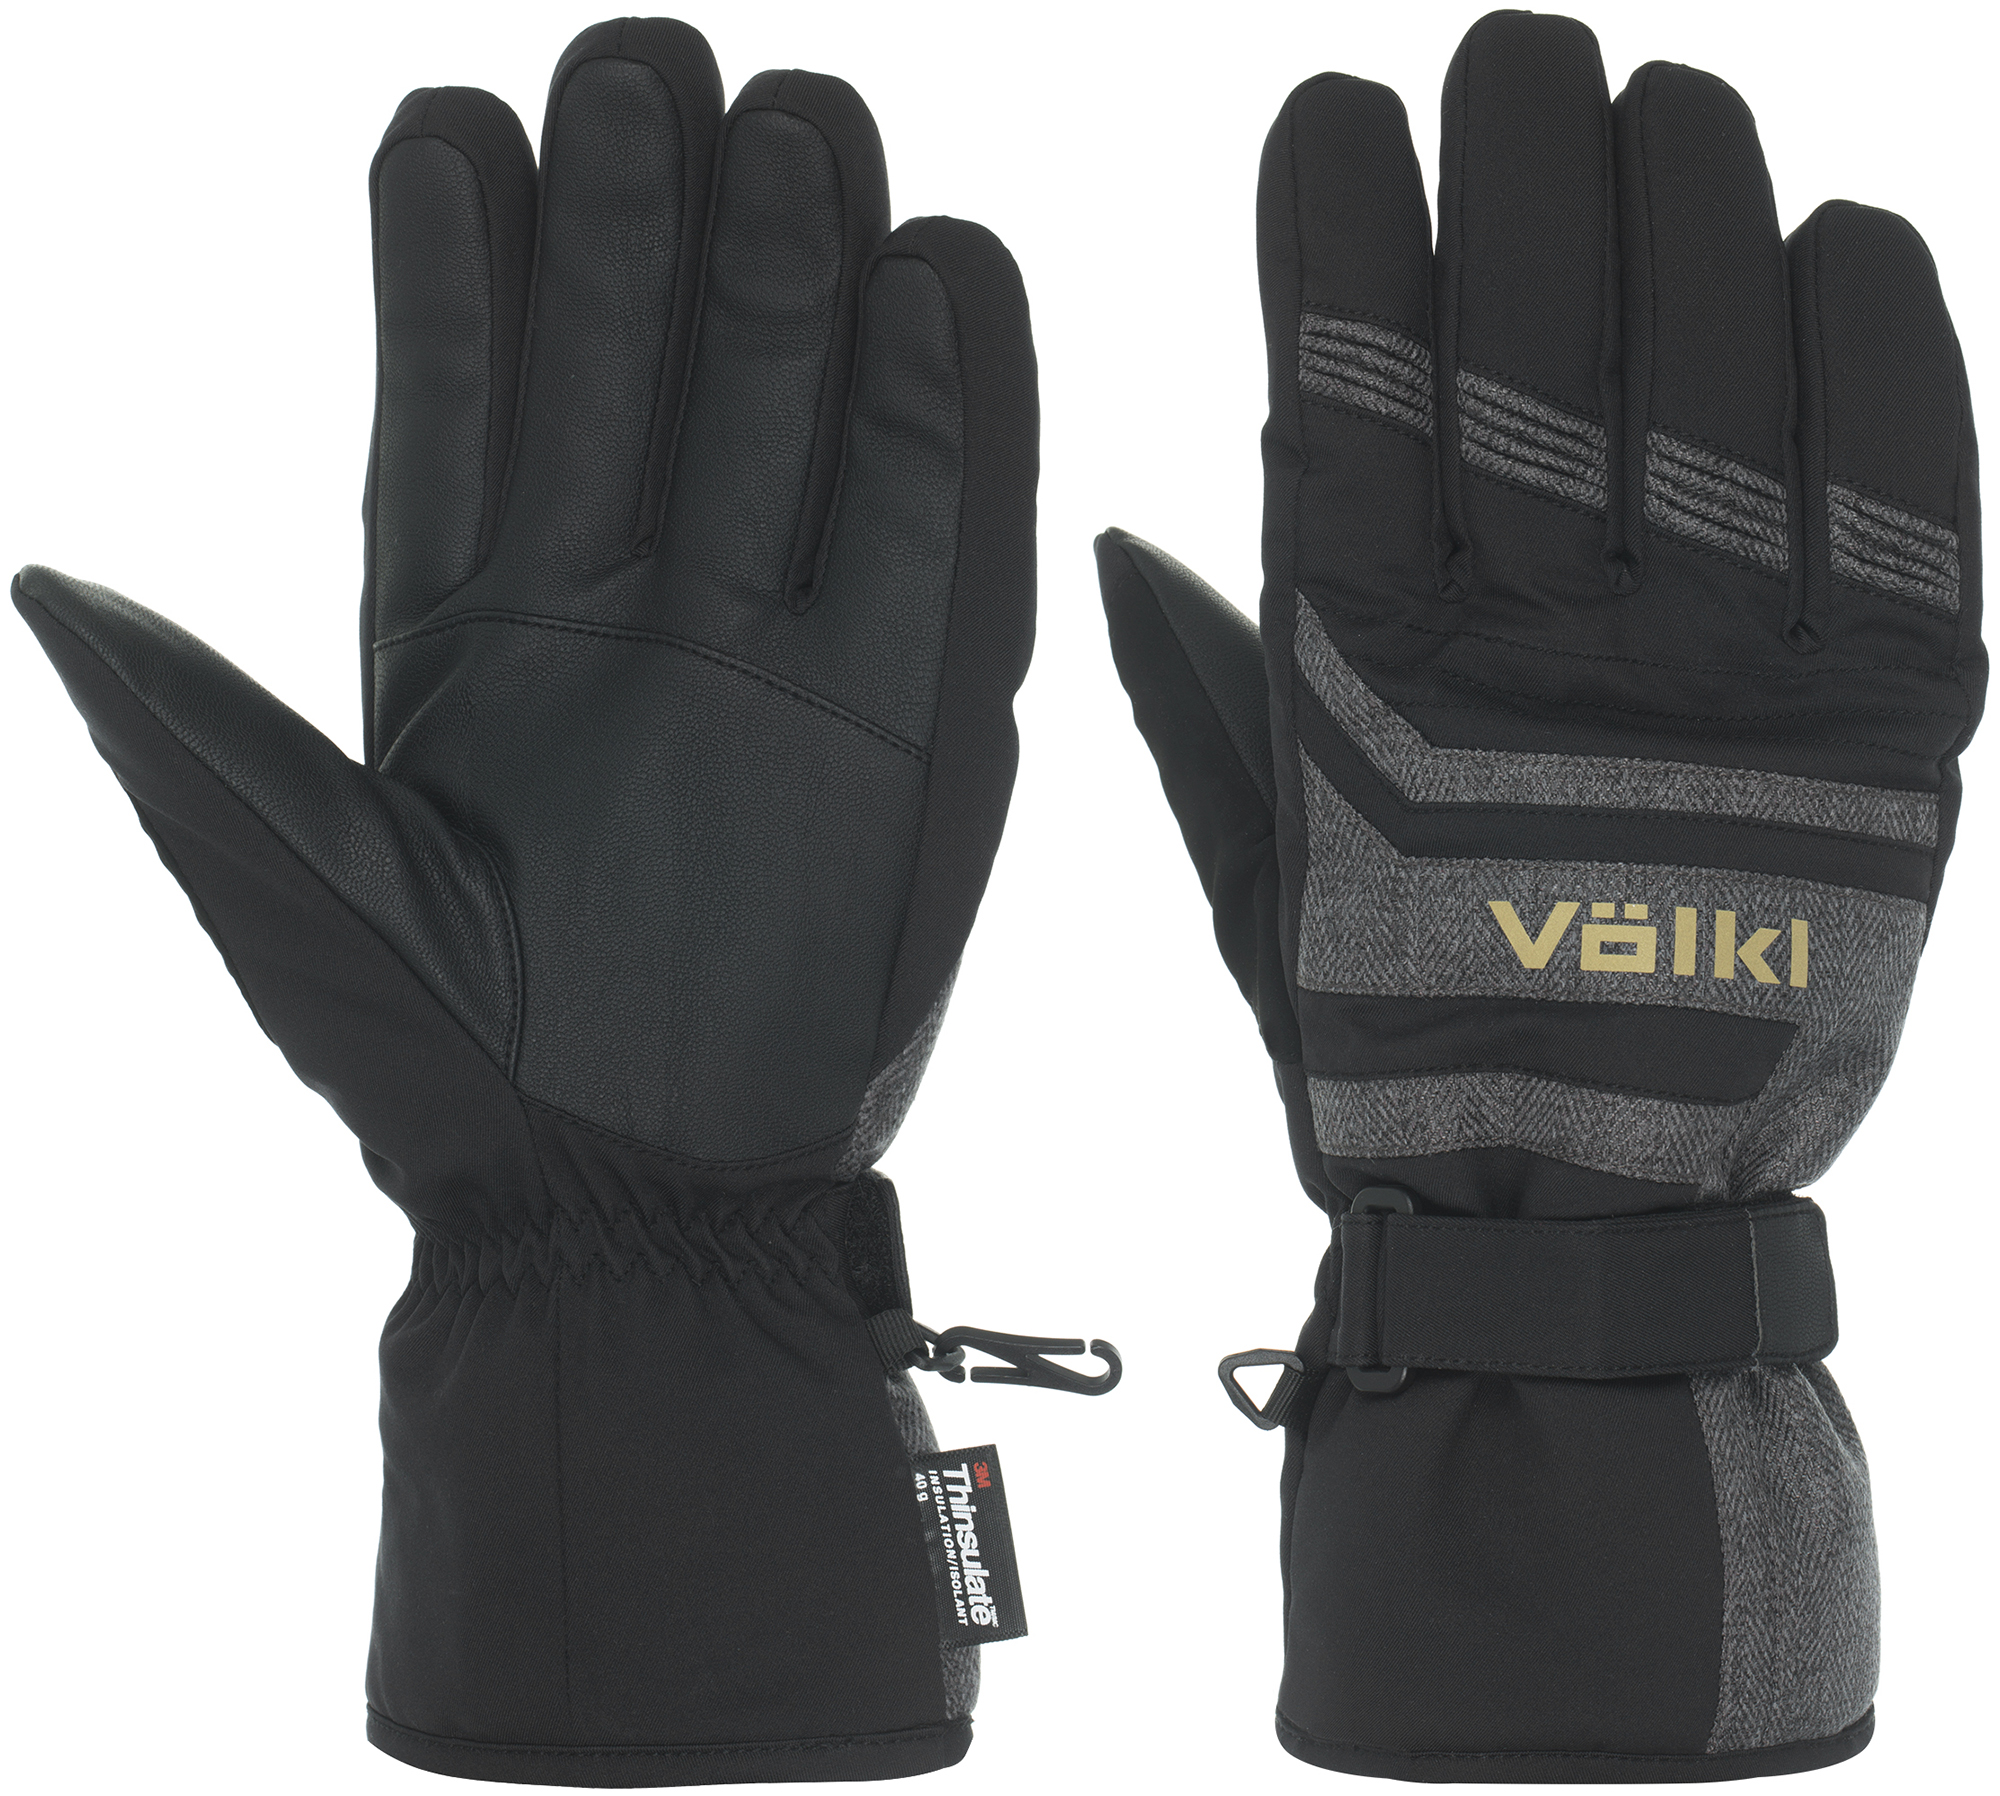 Volkl Перчатки мужские Volkl, размер 10 цена